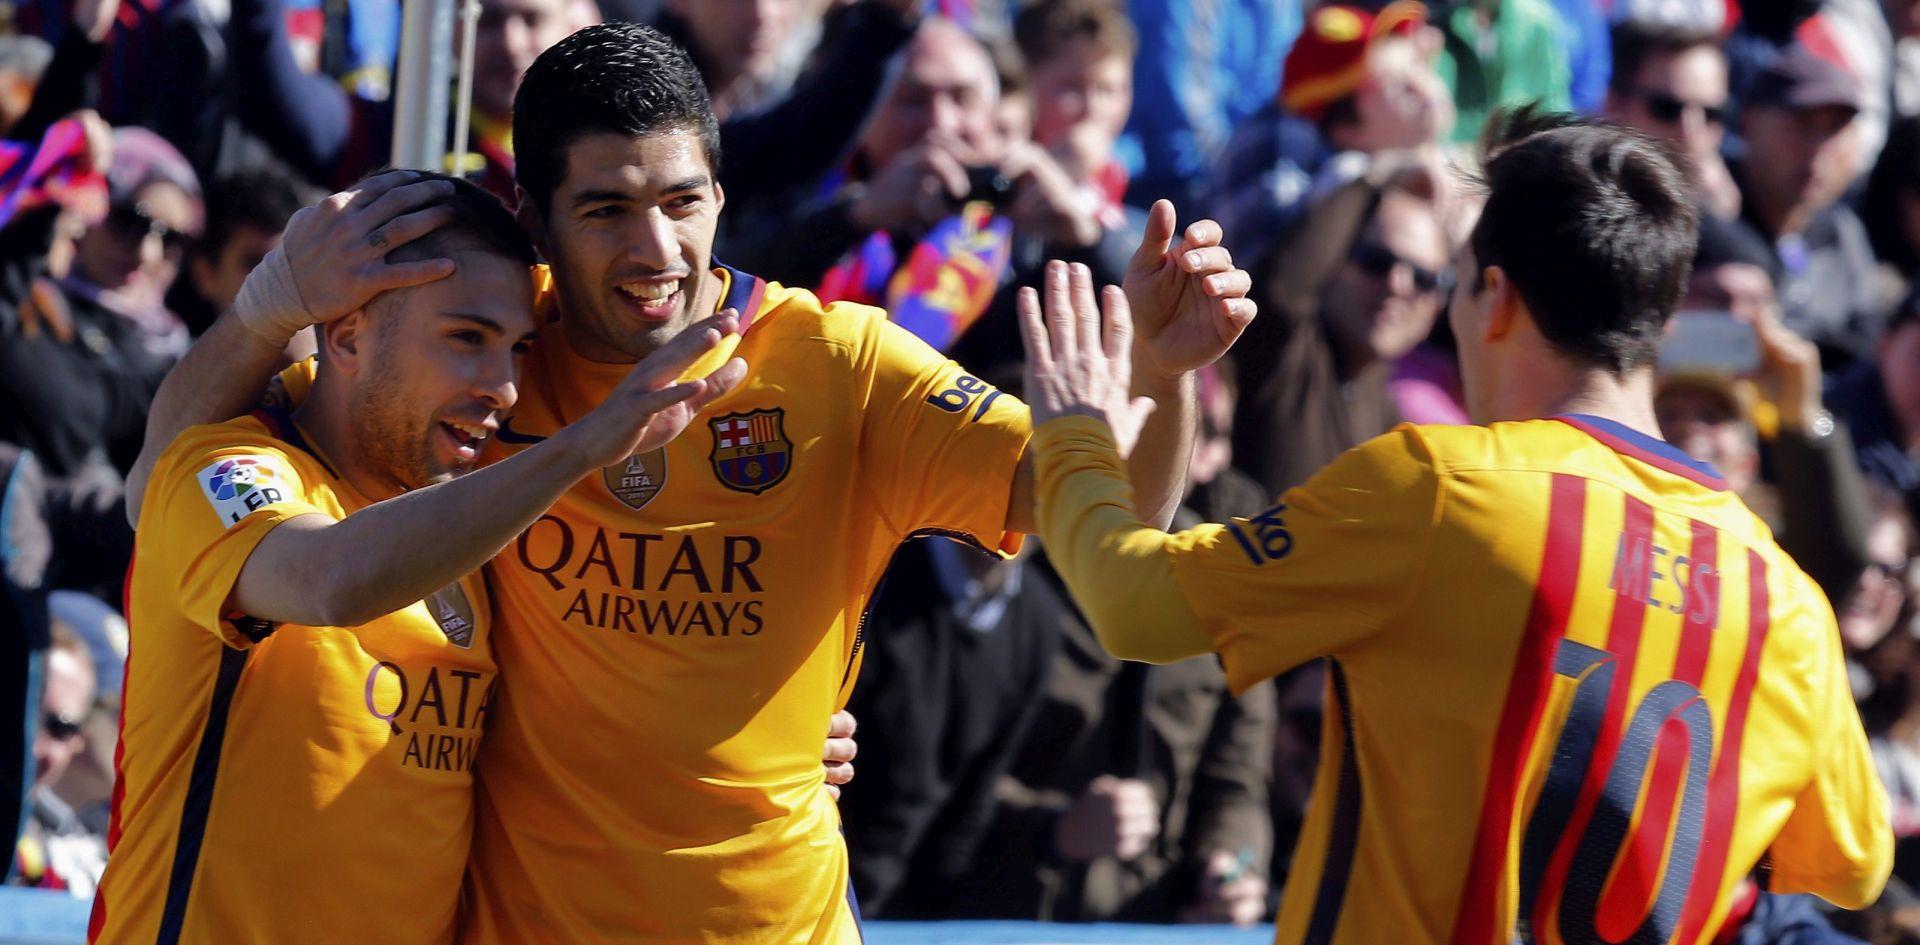 PRIMERA Barcelona slavila s 2:0 protiv Levantea, Messiju poništena dva gola